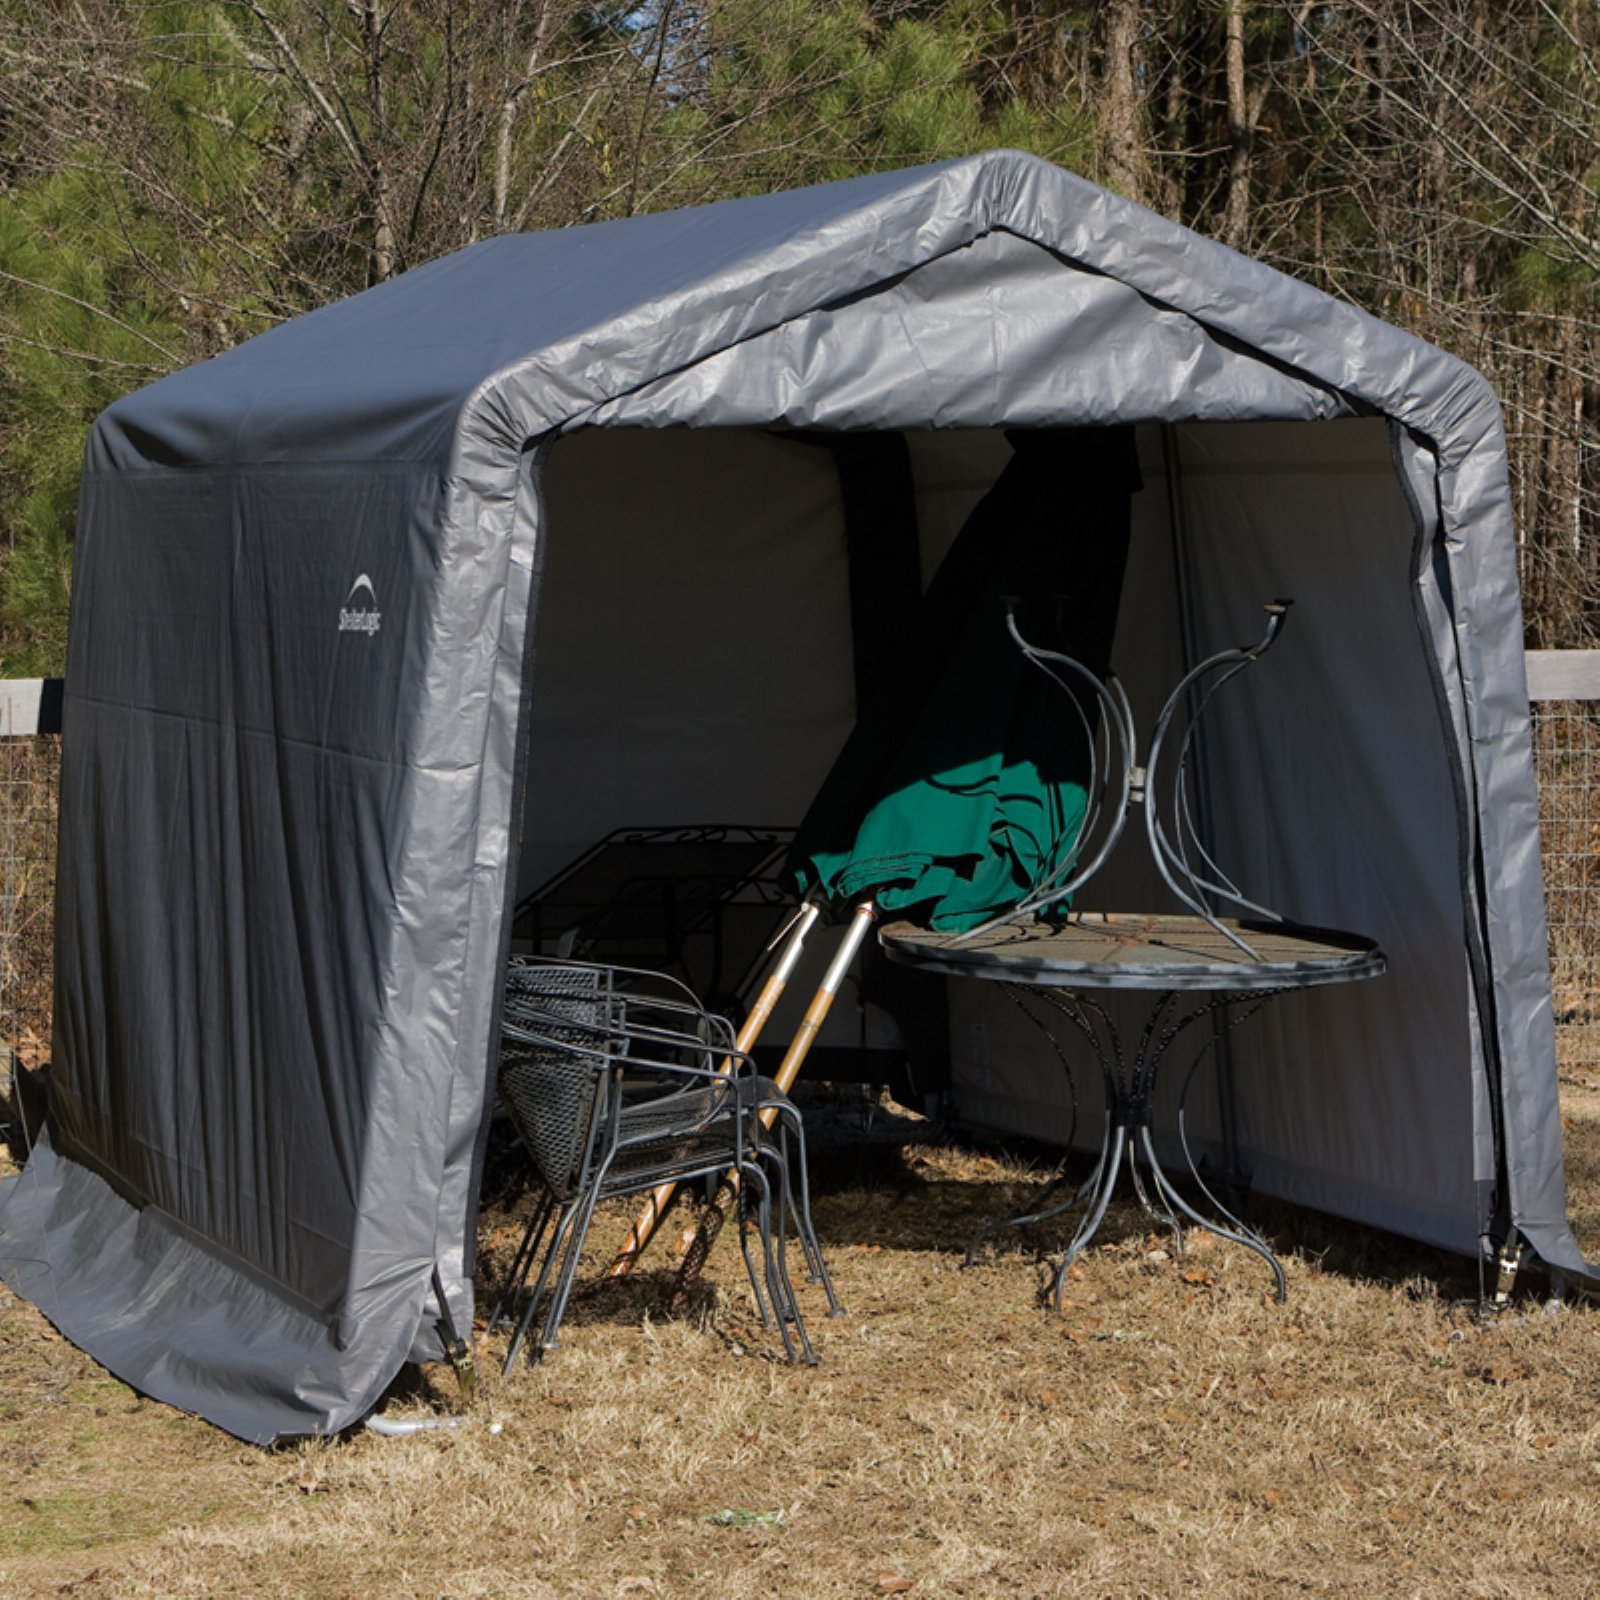 10' x 16' x 8' Peak Style Shelter, Green